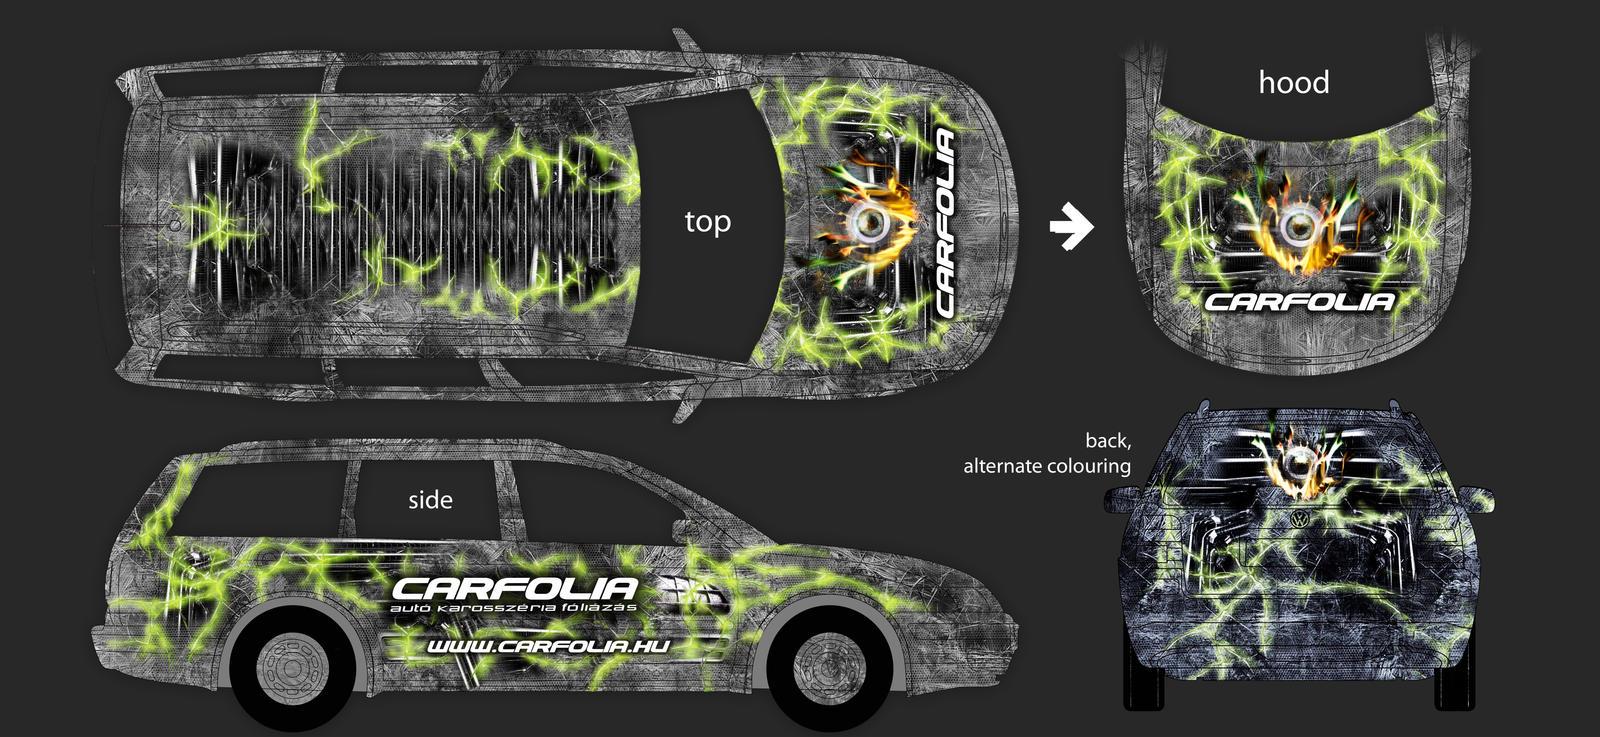 Vinyl car wrap design by hyydra on deviantart